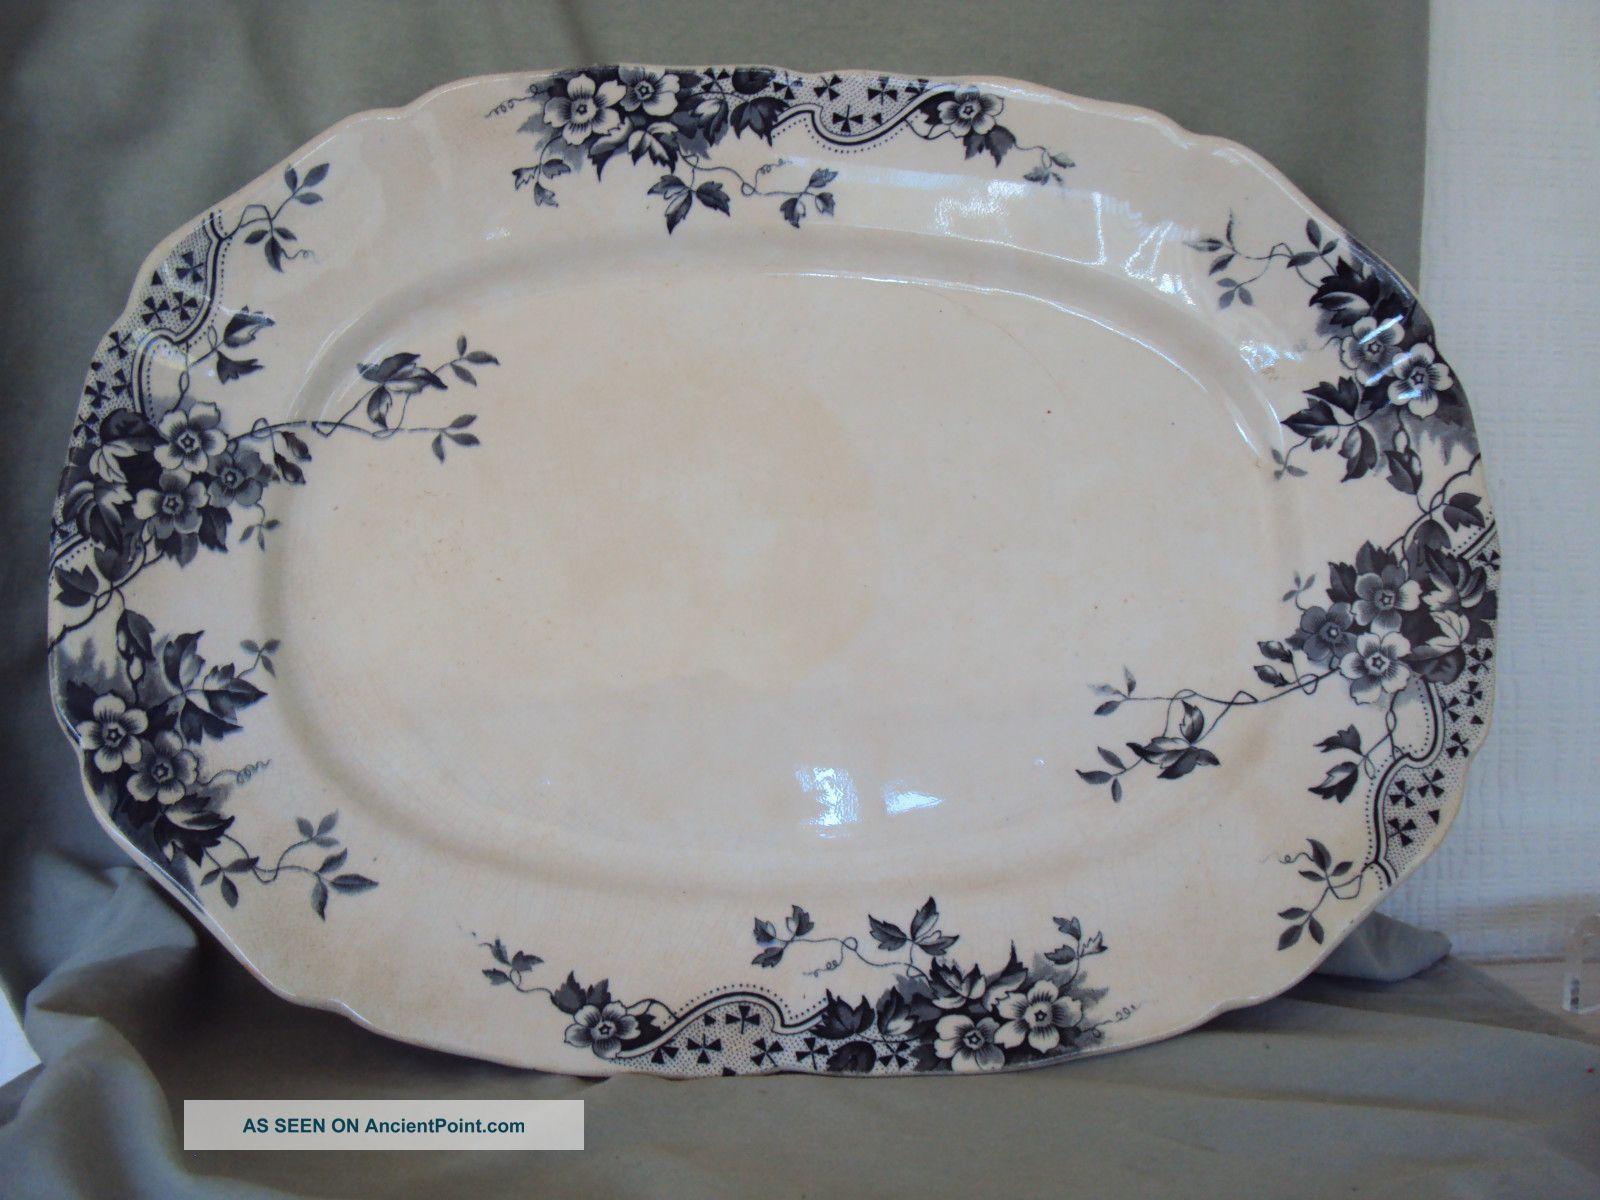 sandon cliff england pottery large serving platter anemones serving platters platters pottery sandon cliff england pottery large